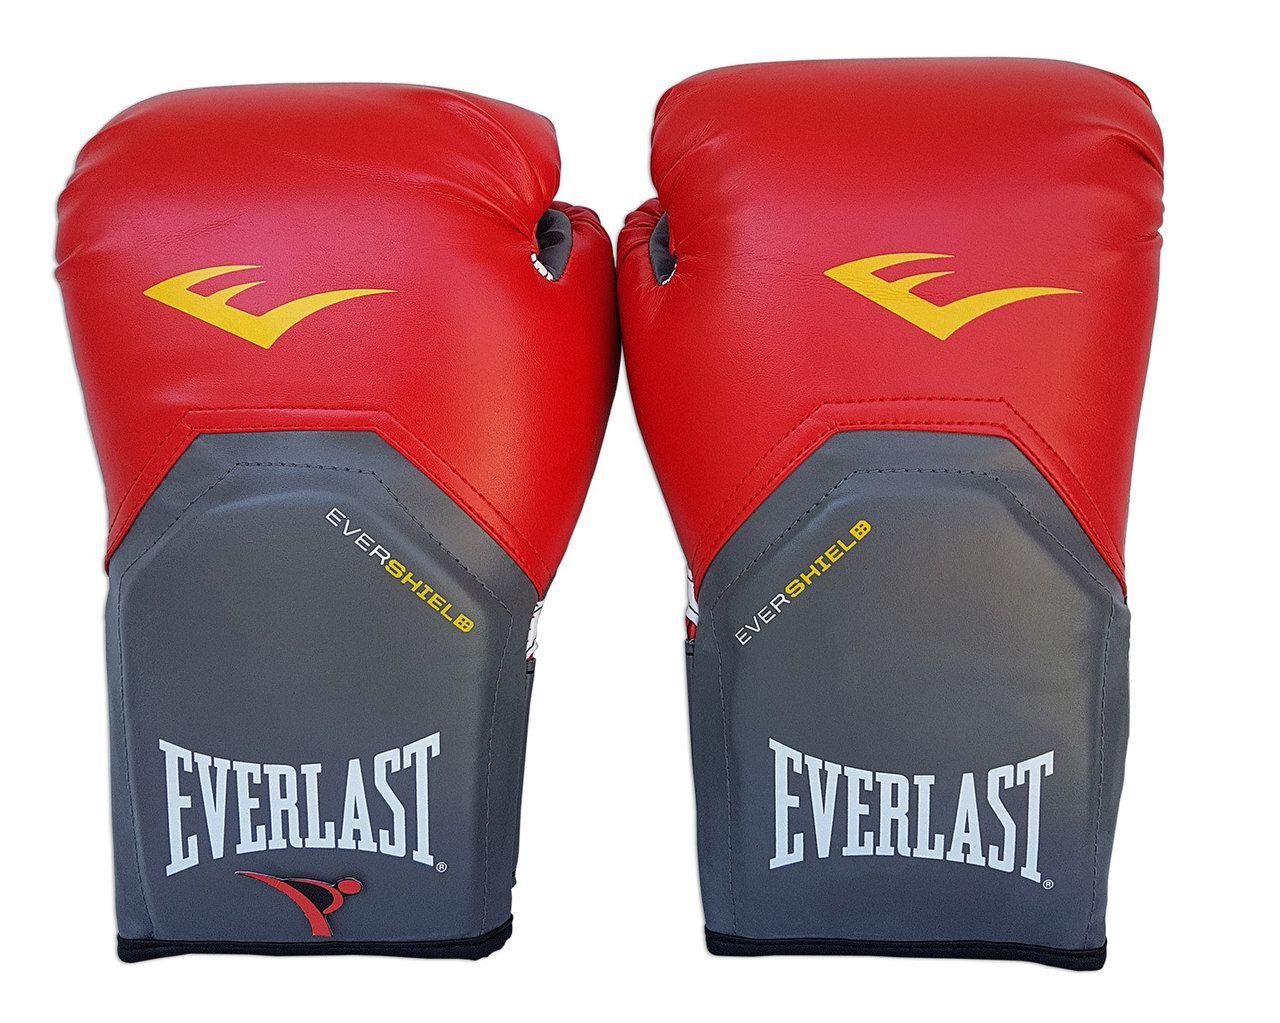 Kit de Boxe / Muay Thai 14oz - Vermelho - Pro Style - Everlast  - PRALUTA SHOP